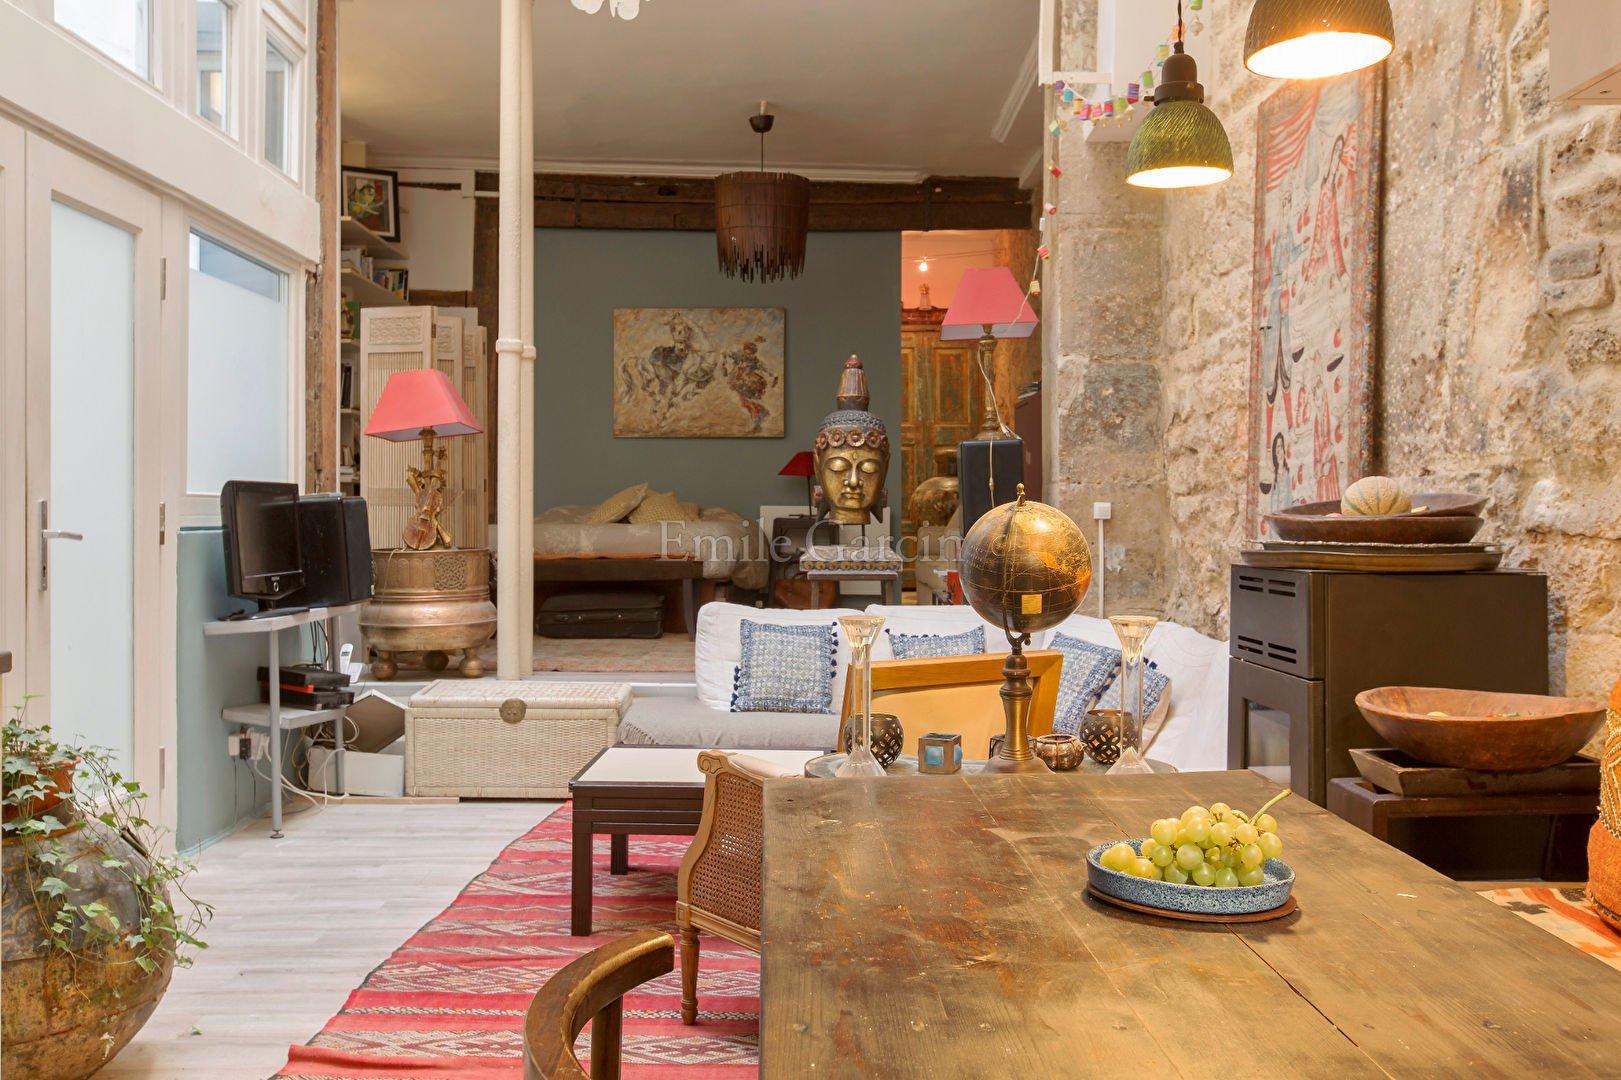 For sale loft-style apartment, in Paris 3rd - Marais in ...